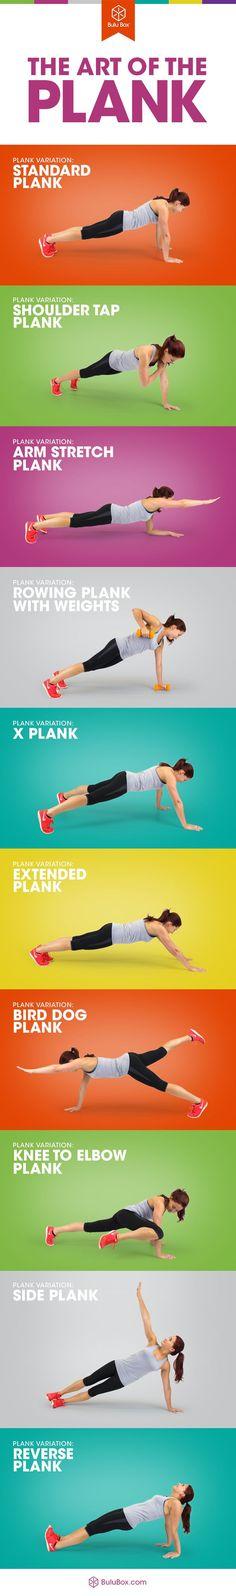 52 best 30 day plank challenge images 30 day plank challenge rh pinterest com